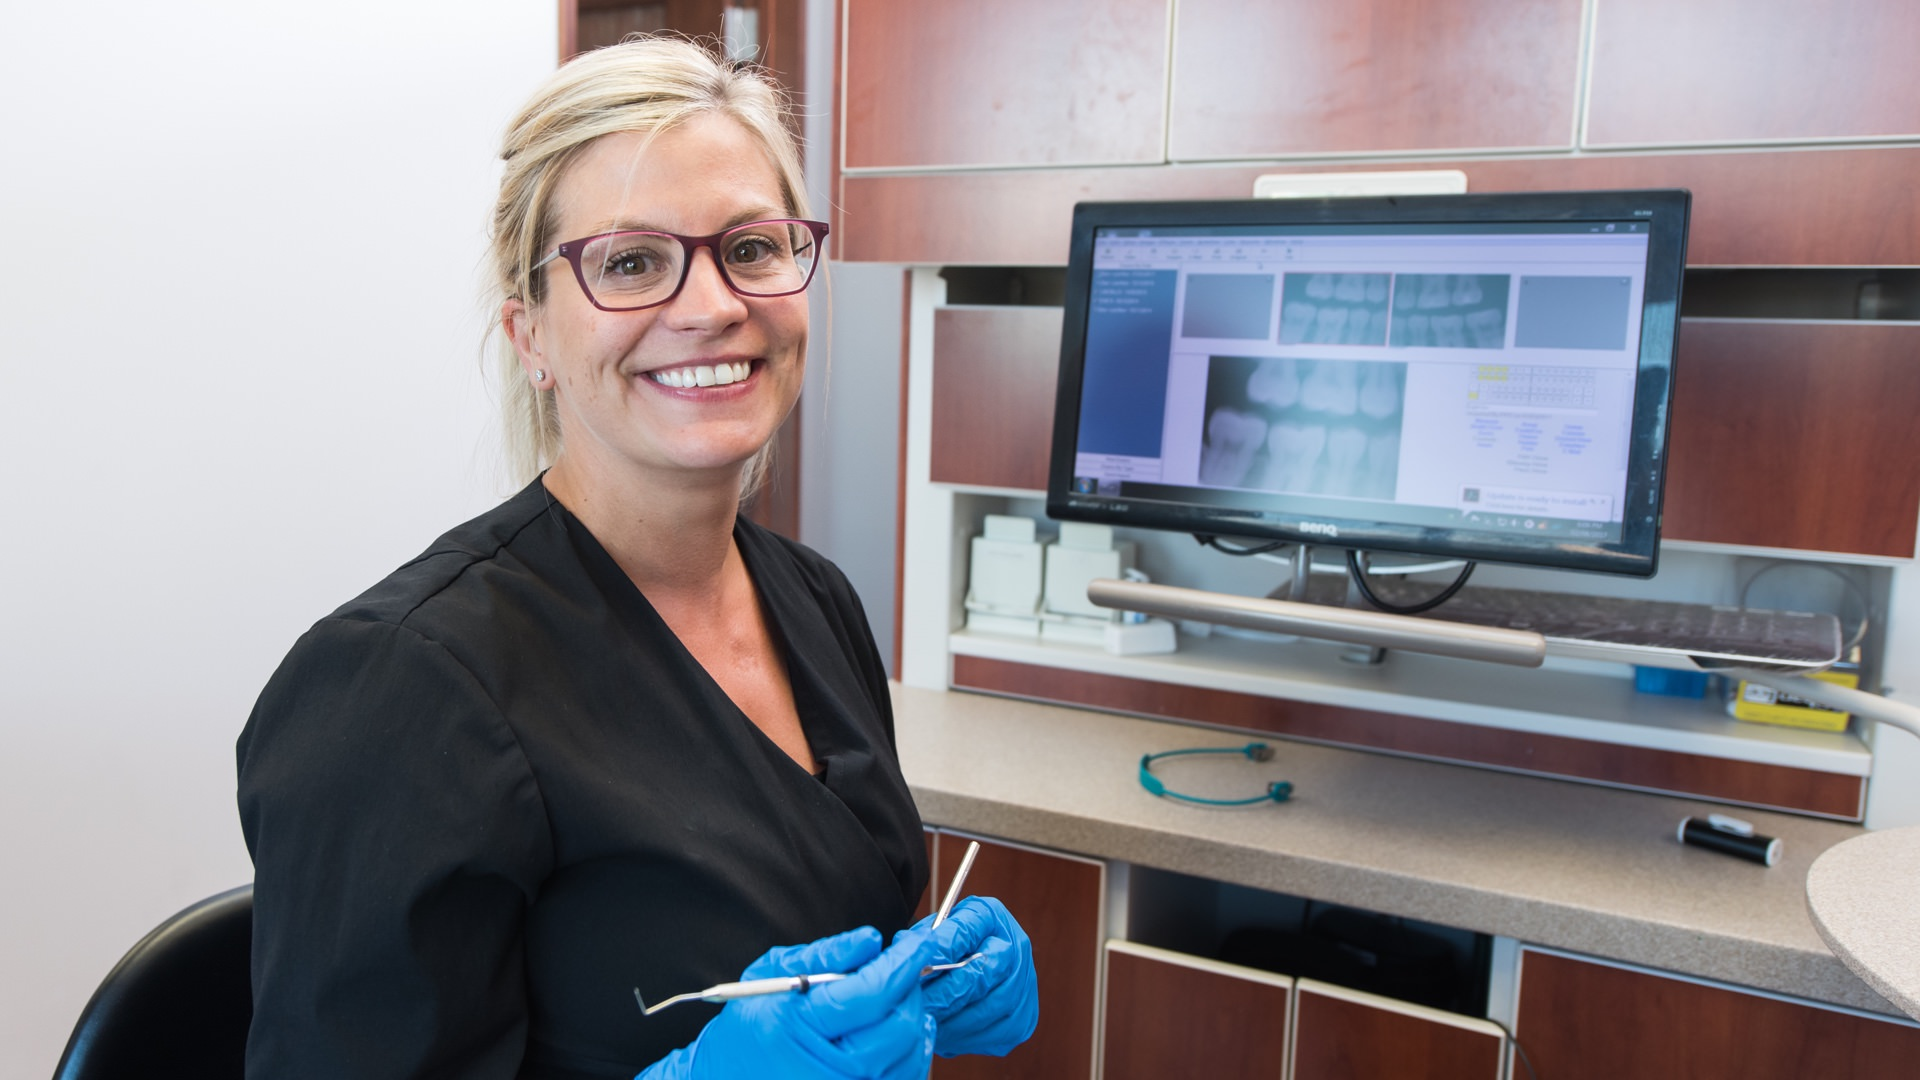 hygienist-smiling